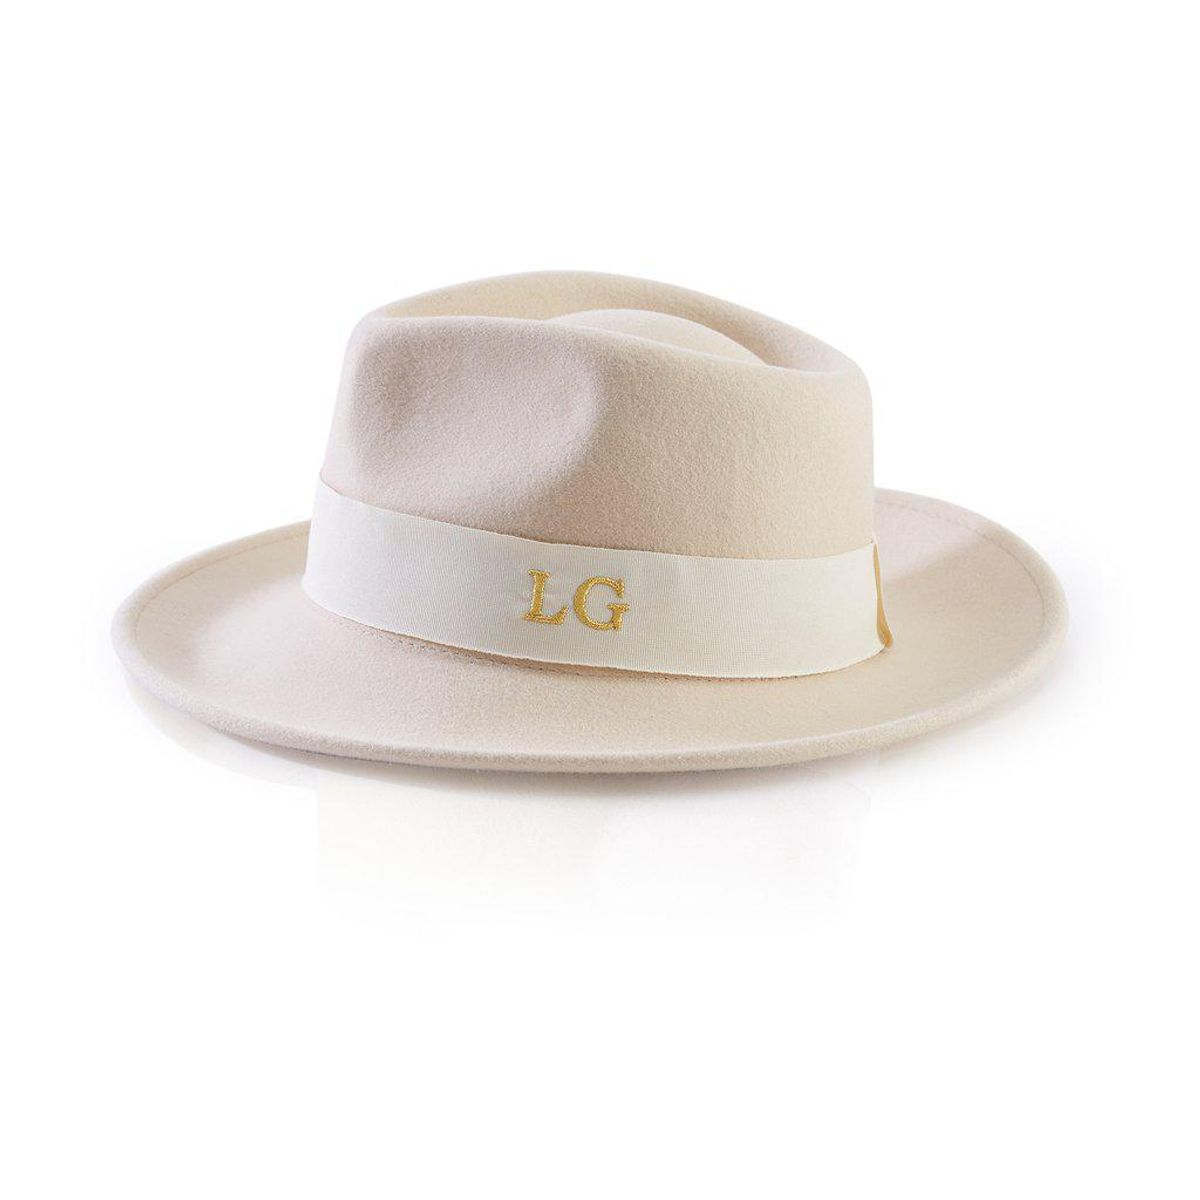 ha designs personalised wool felt fedora hat